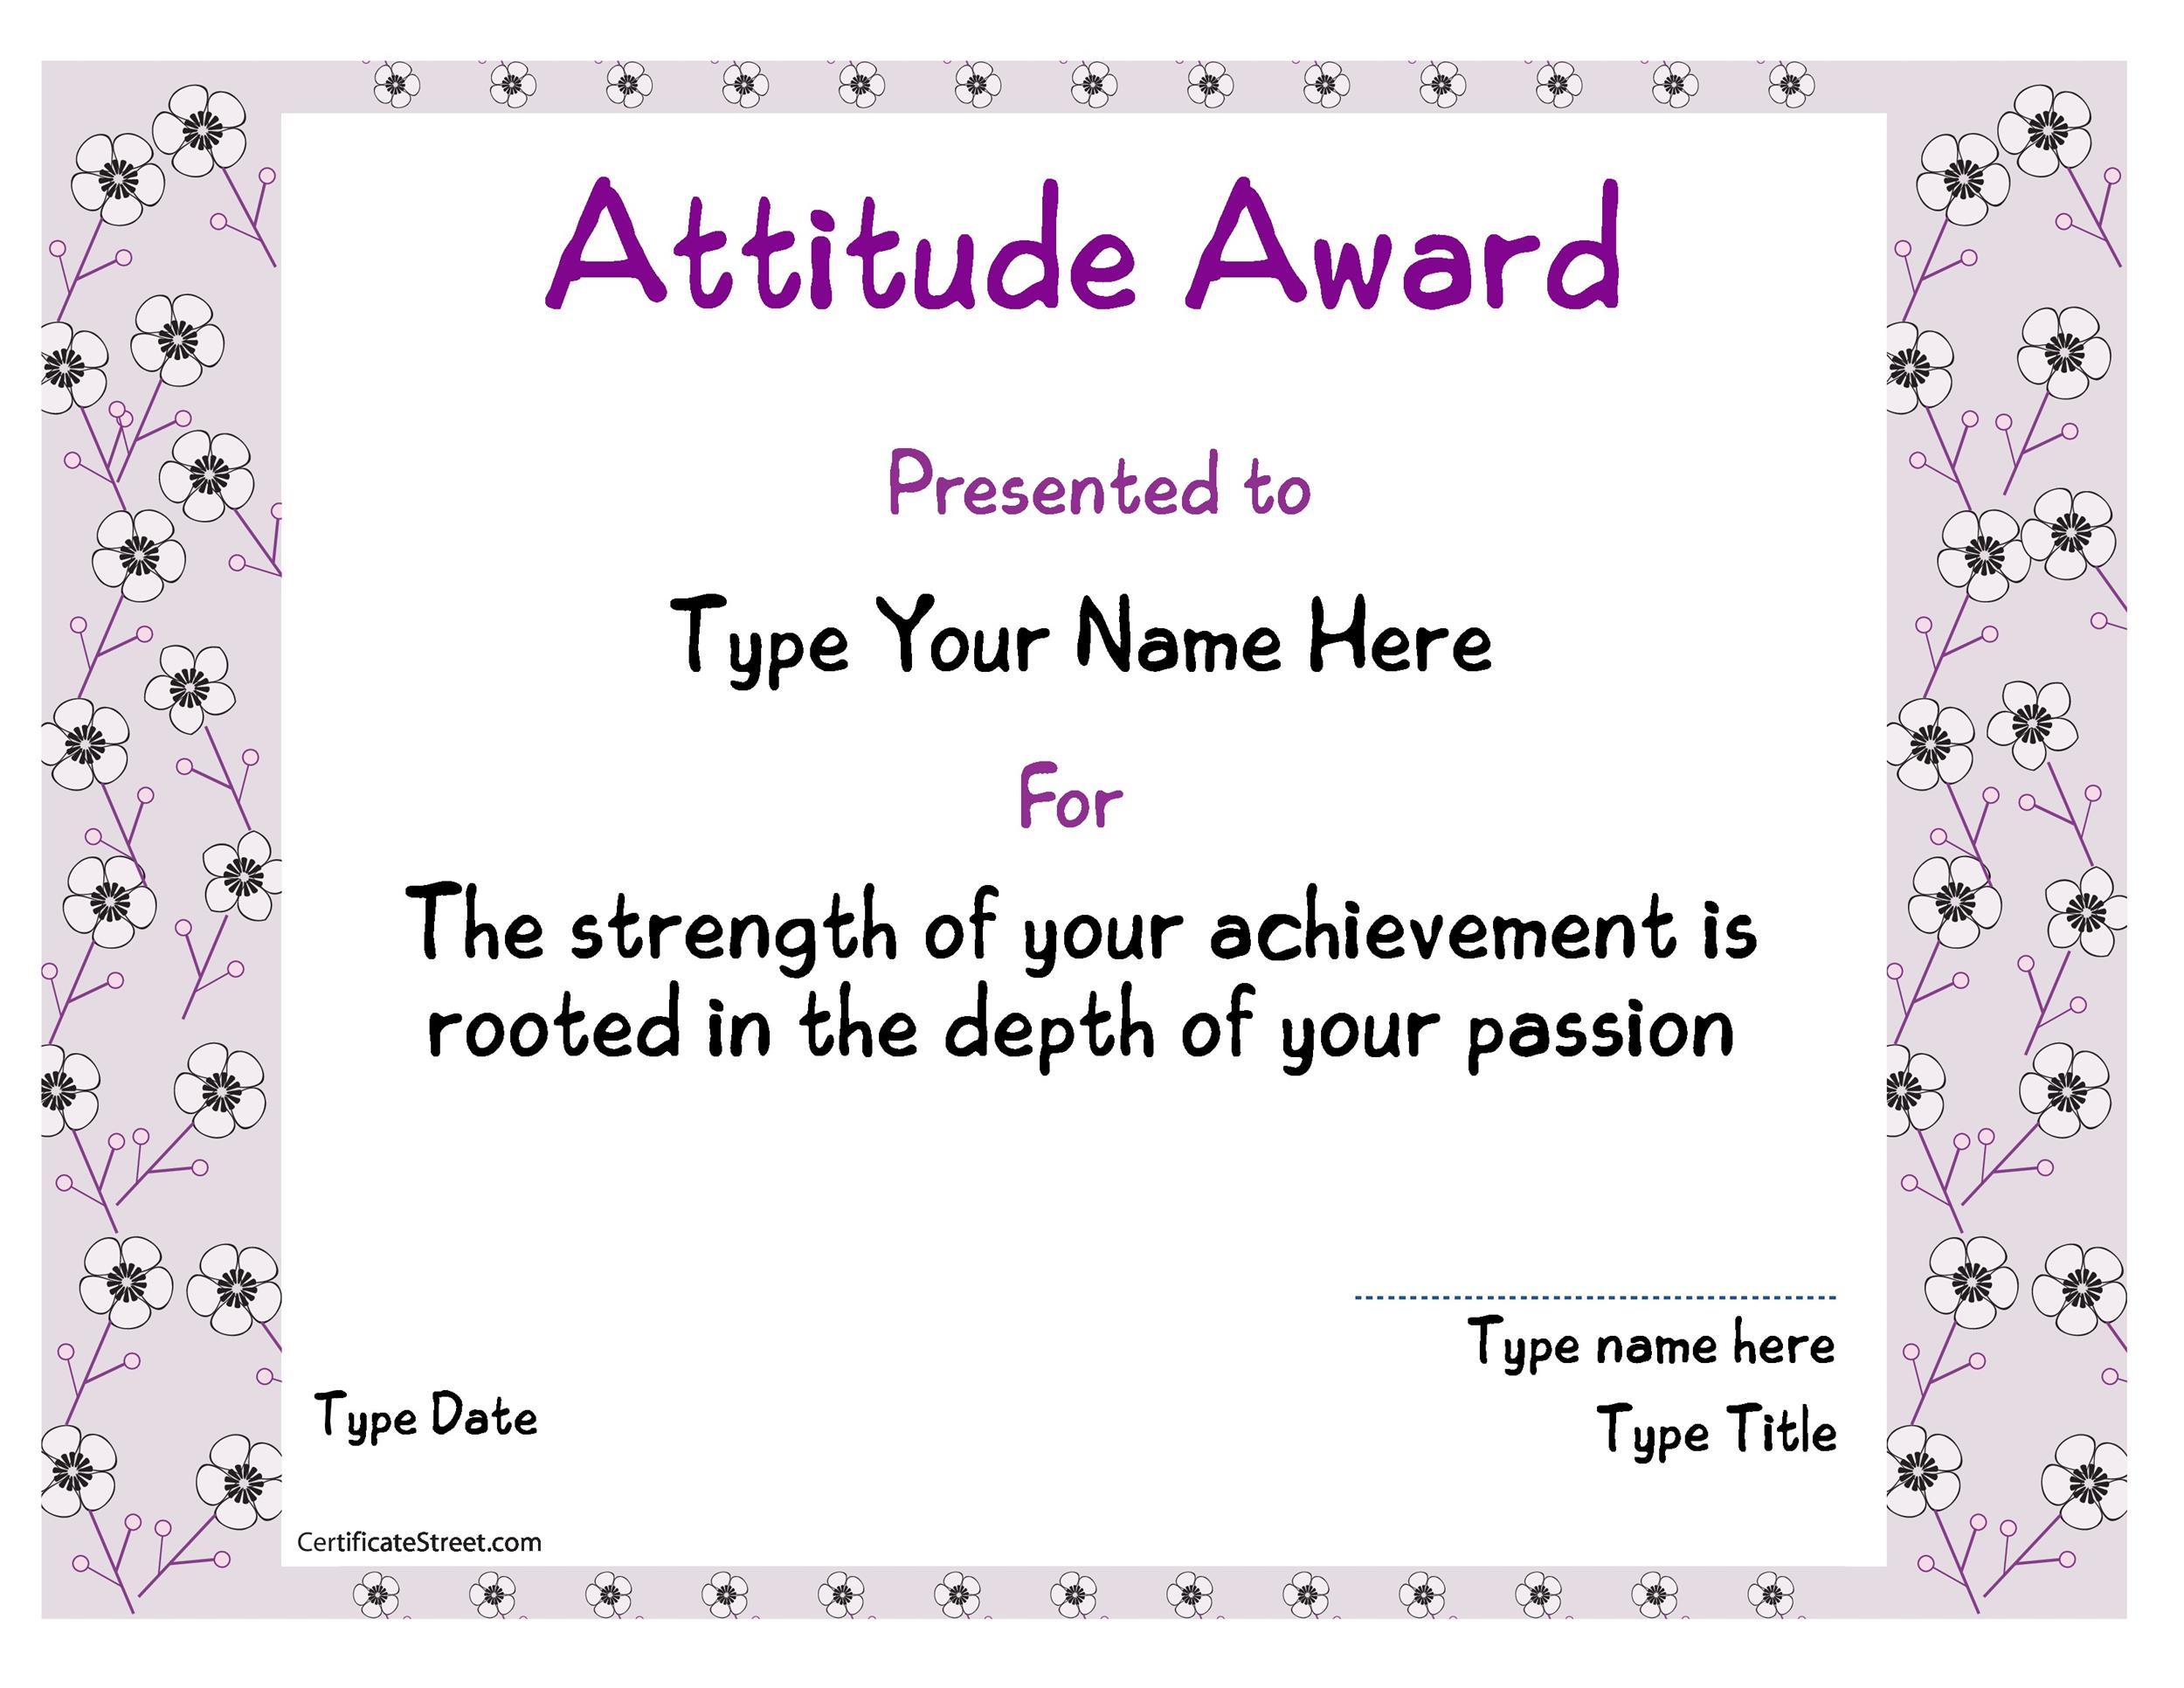 worst employee award - Intoanysearch